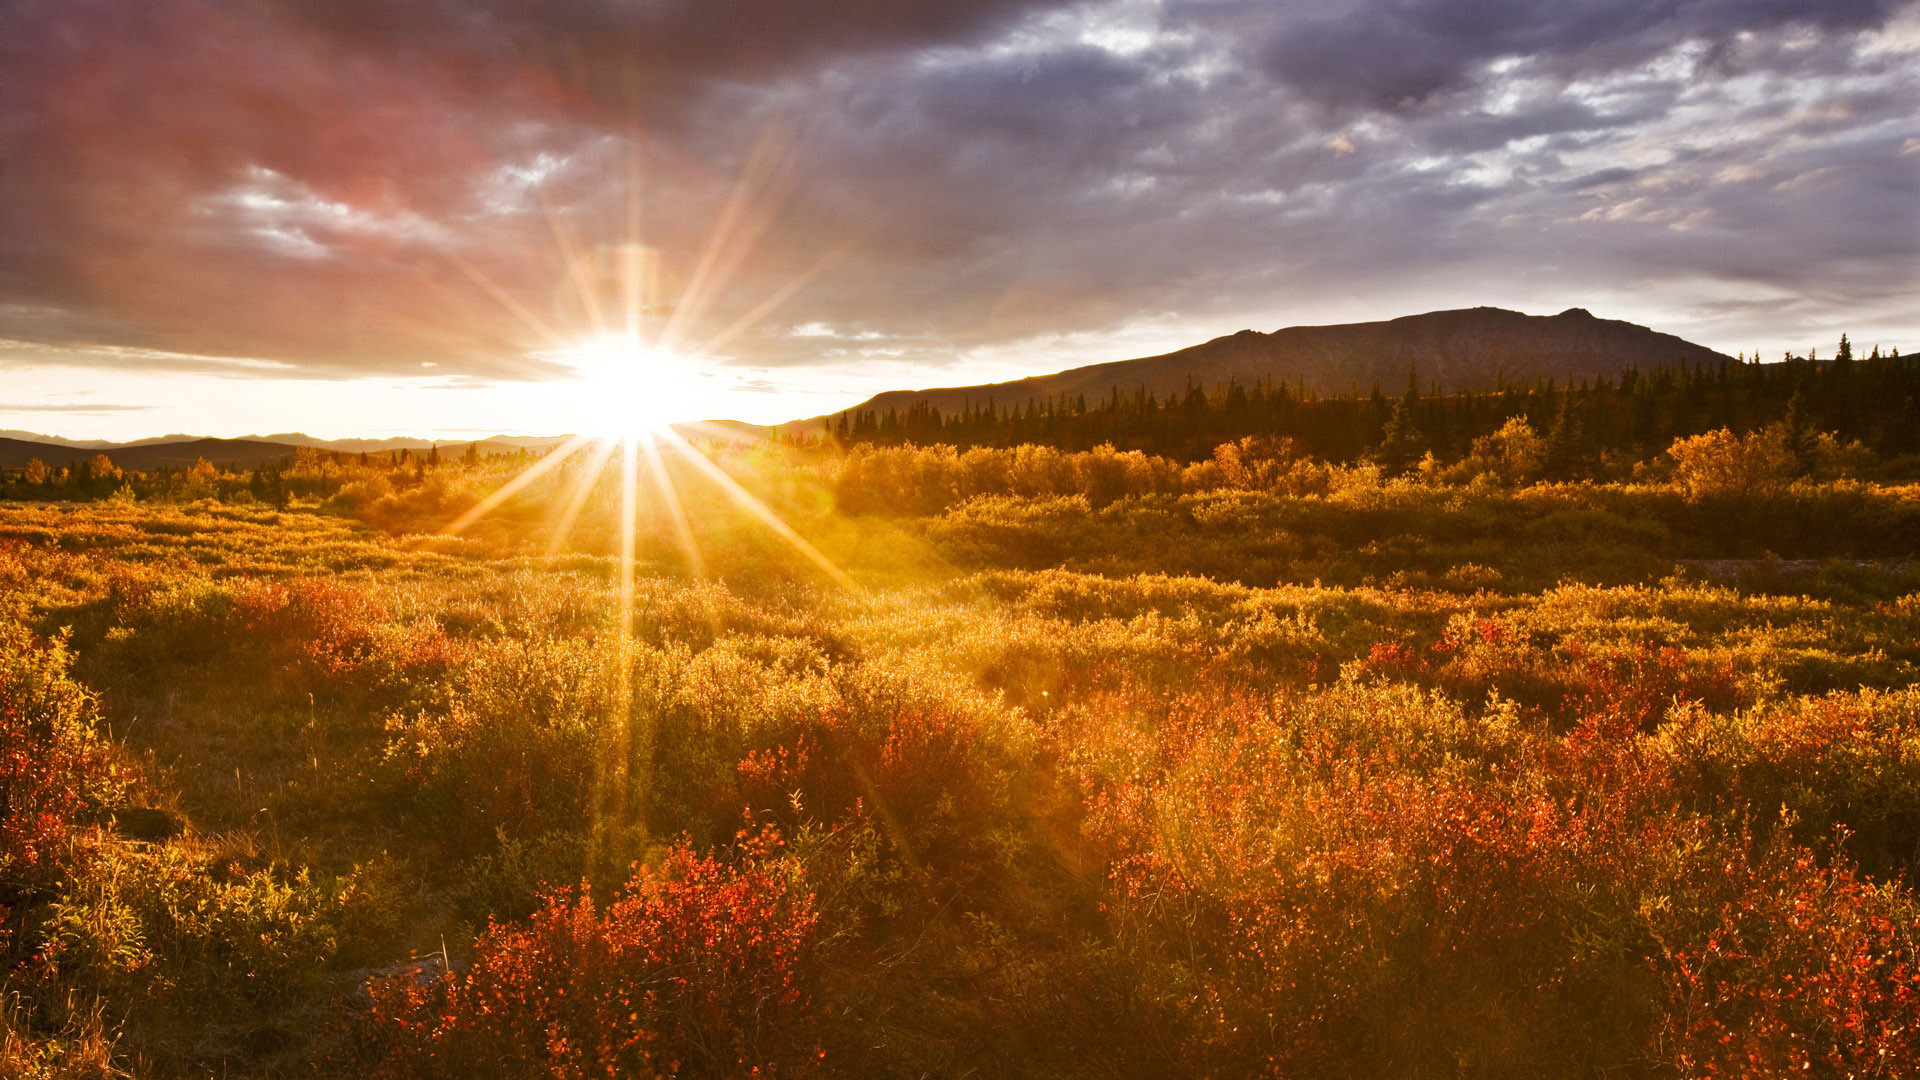 Sunrise Wallpaper Free Download HD – HD Wallpaperia